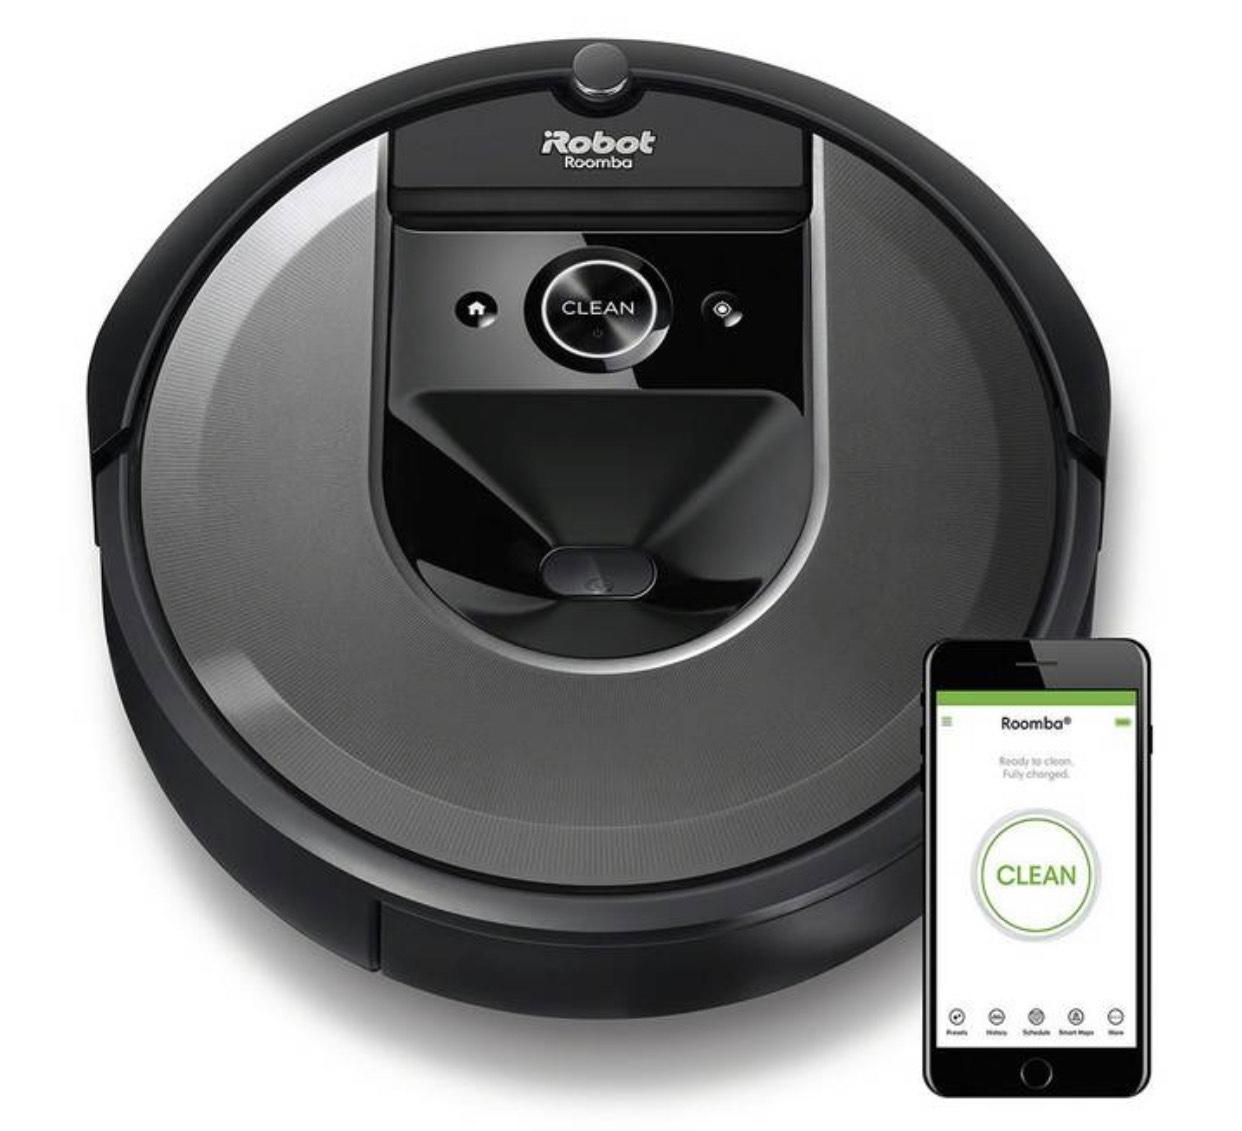 [iRobot] (direkt vom Hersteller!) Roomba i7 599€